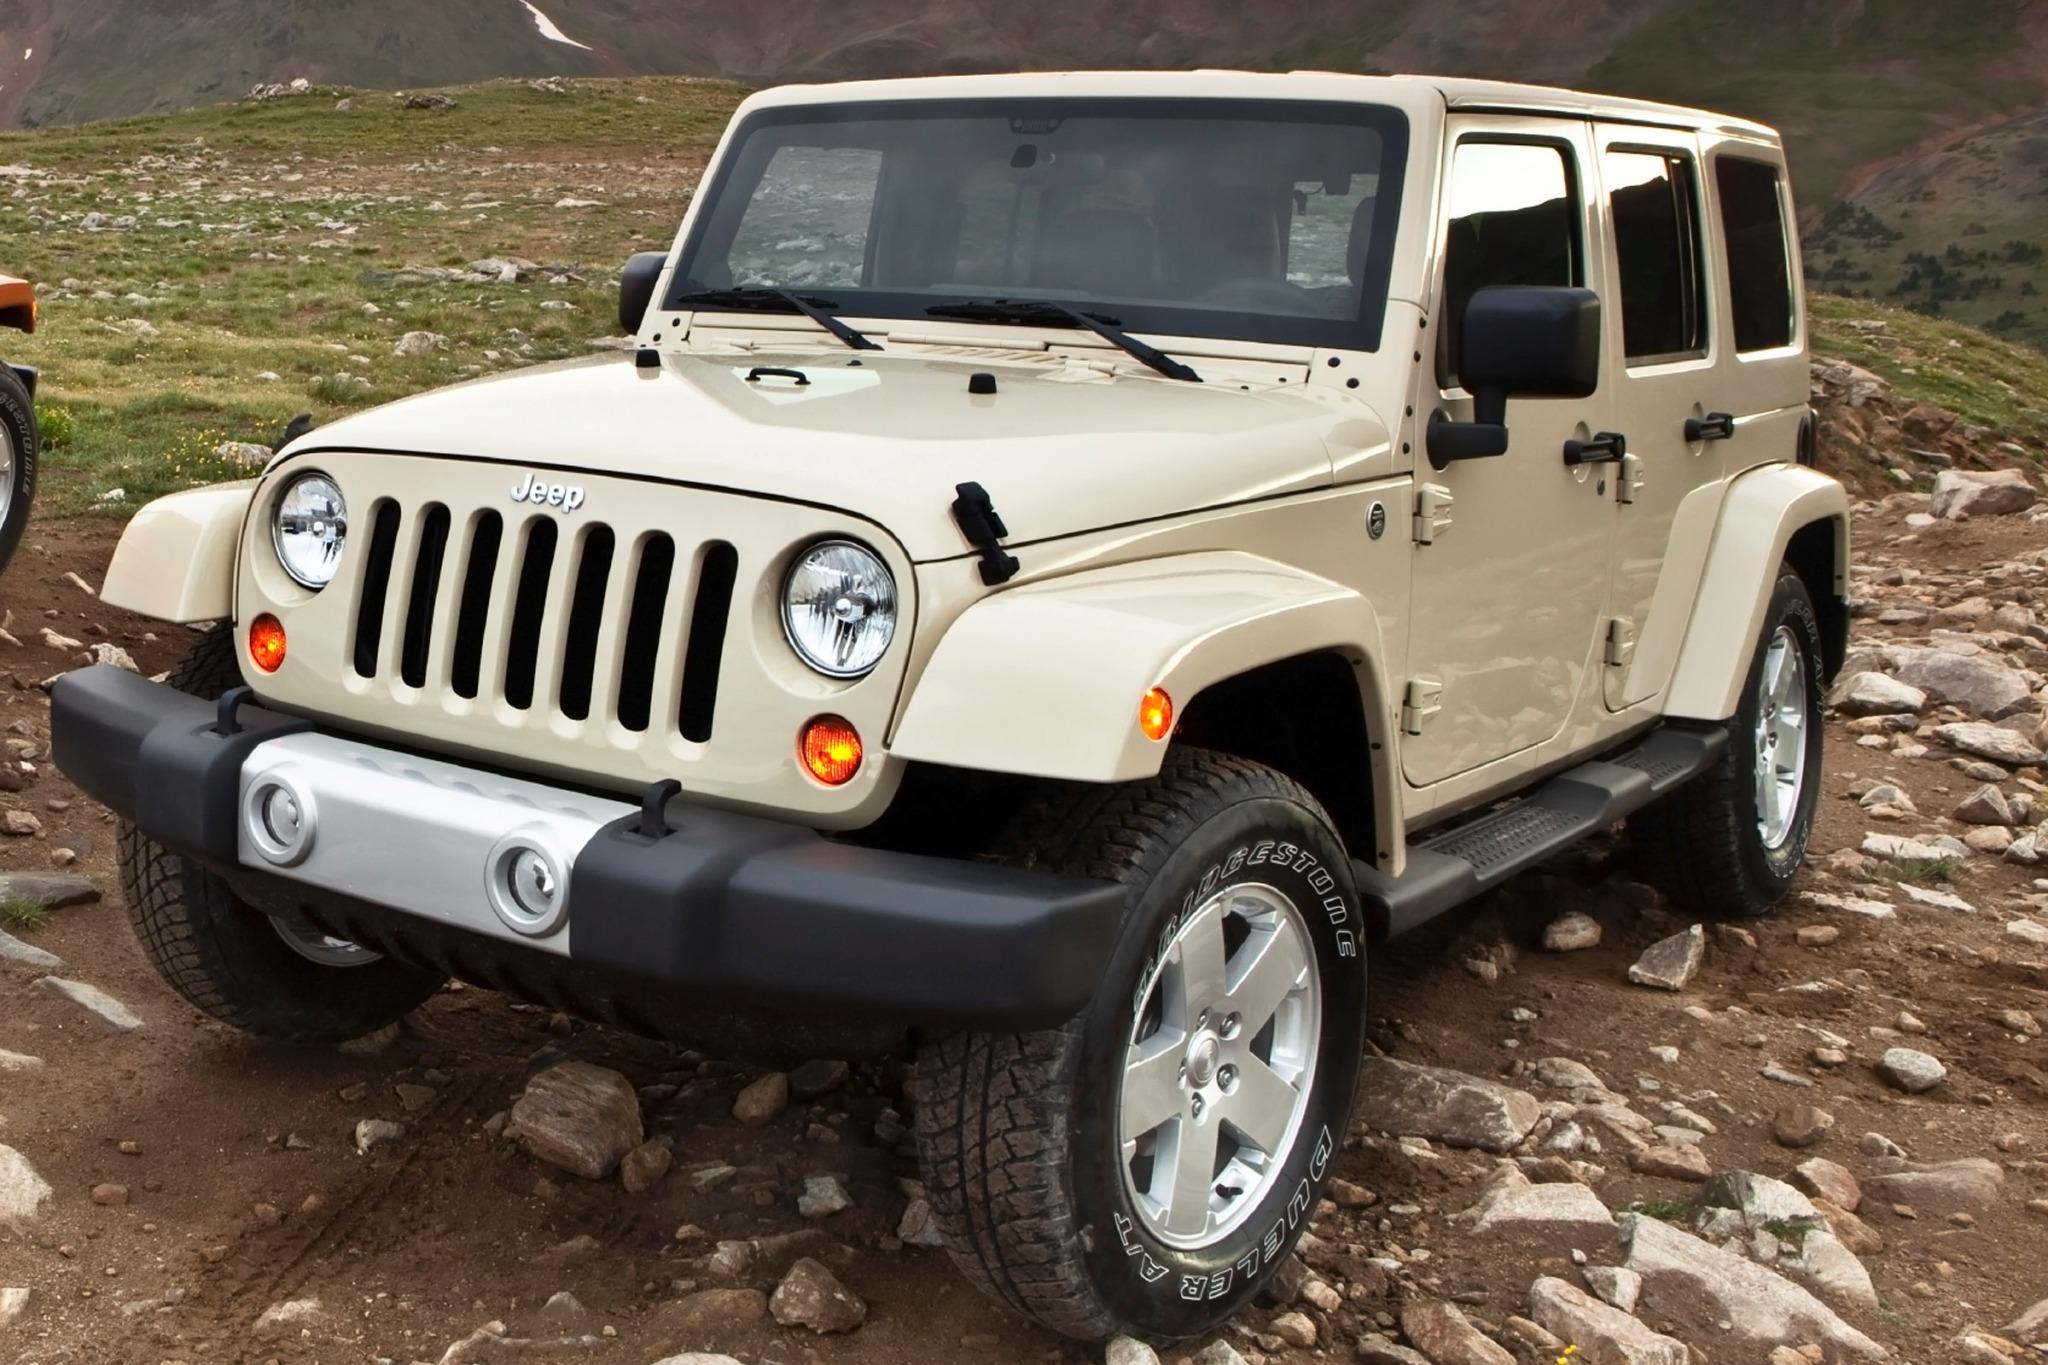 100 jeep renegade convertible jeep wrangler 40 renegade 2dr for sale in leighton buzzard. Black Bedroom Furniture Sets. Home Design Ideas